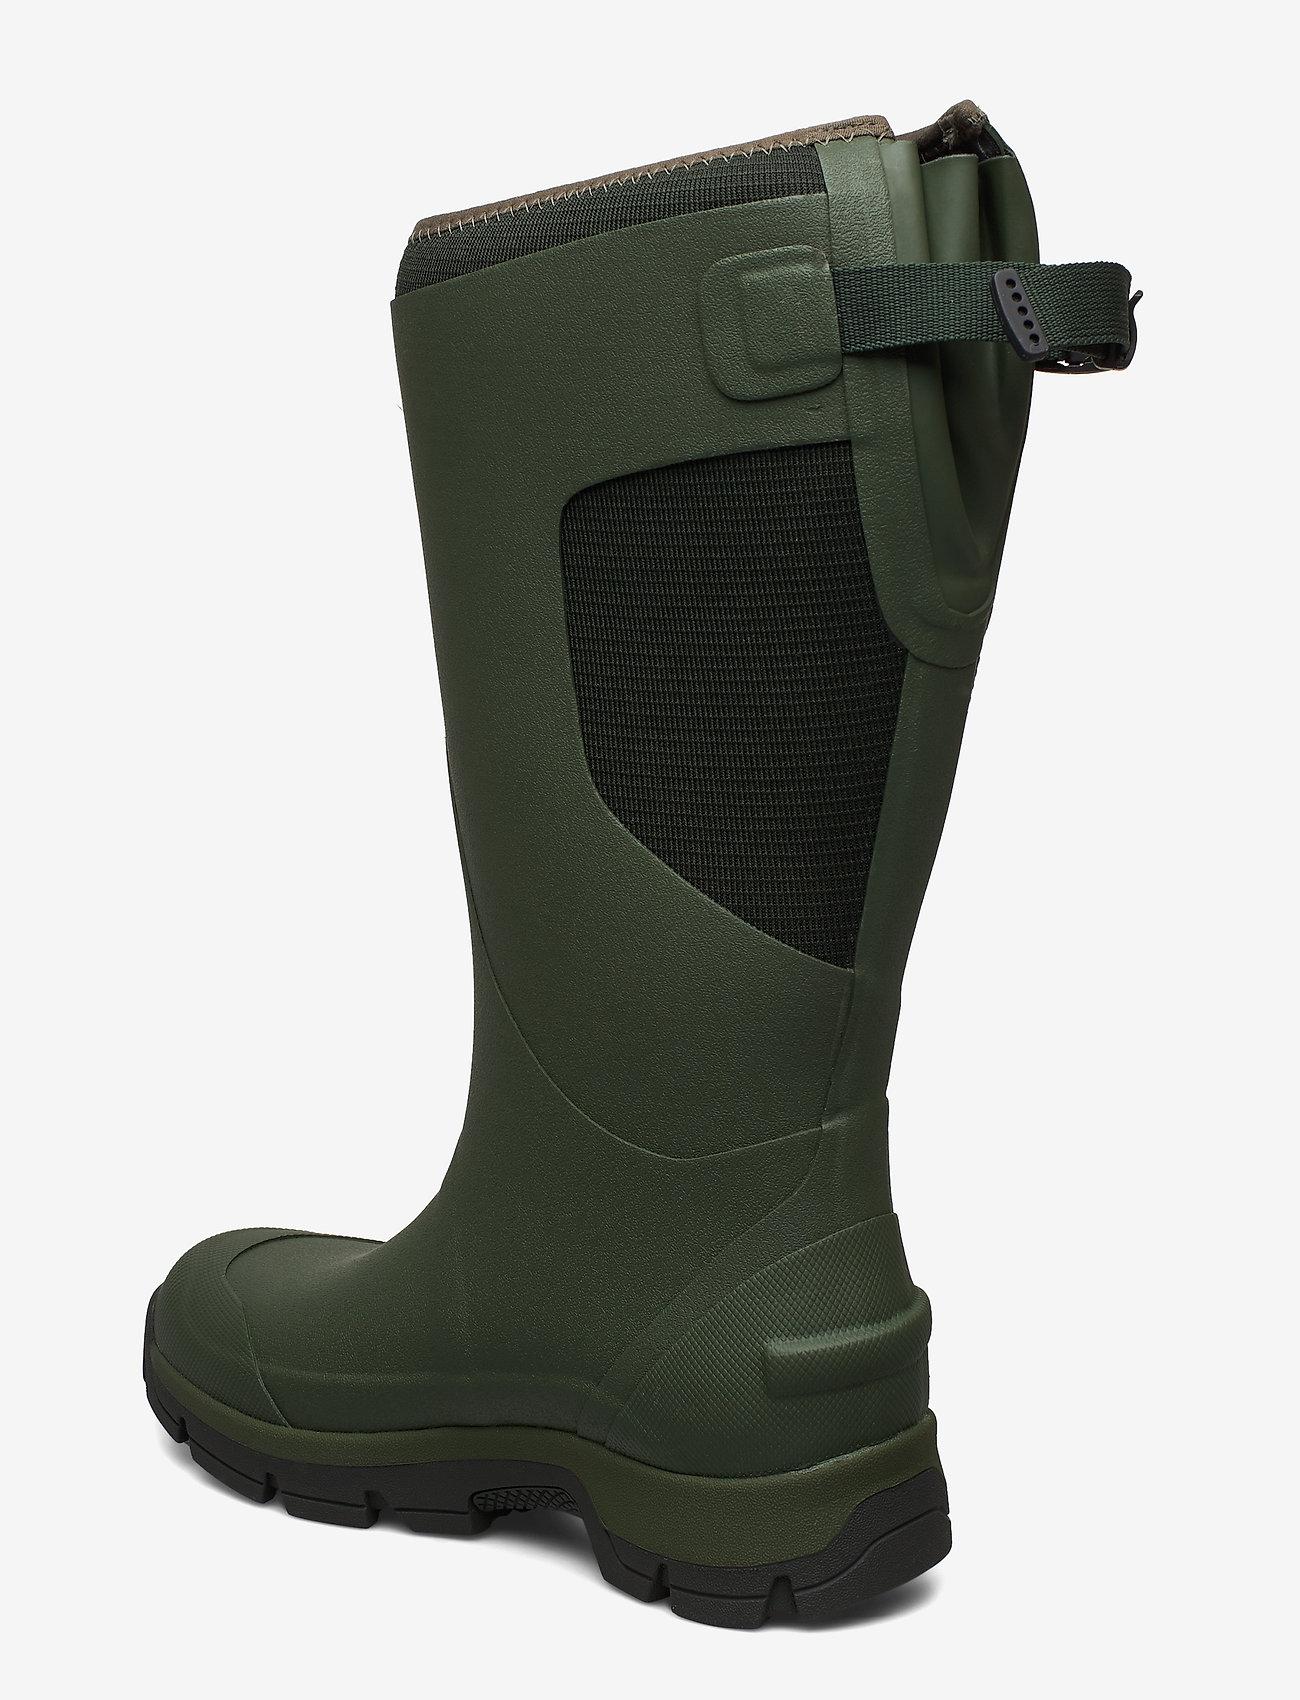 Tornevik Neo (Green) - Tretorn